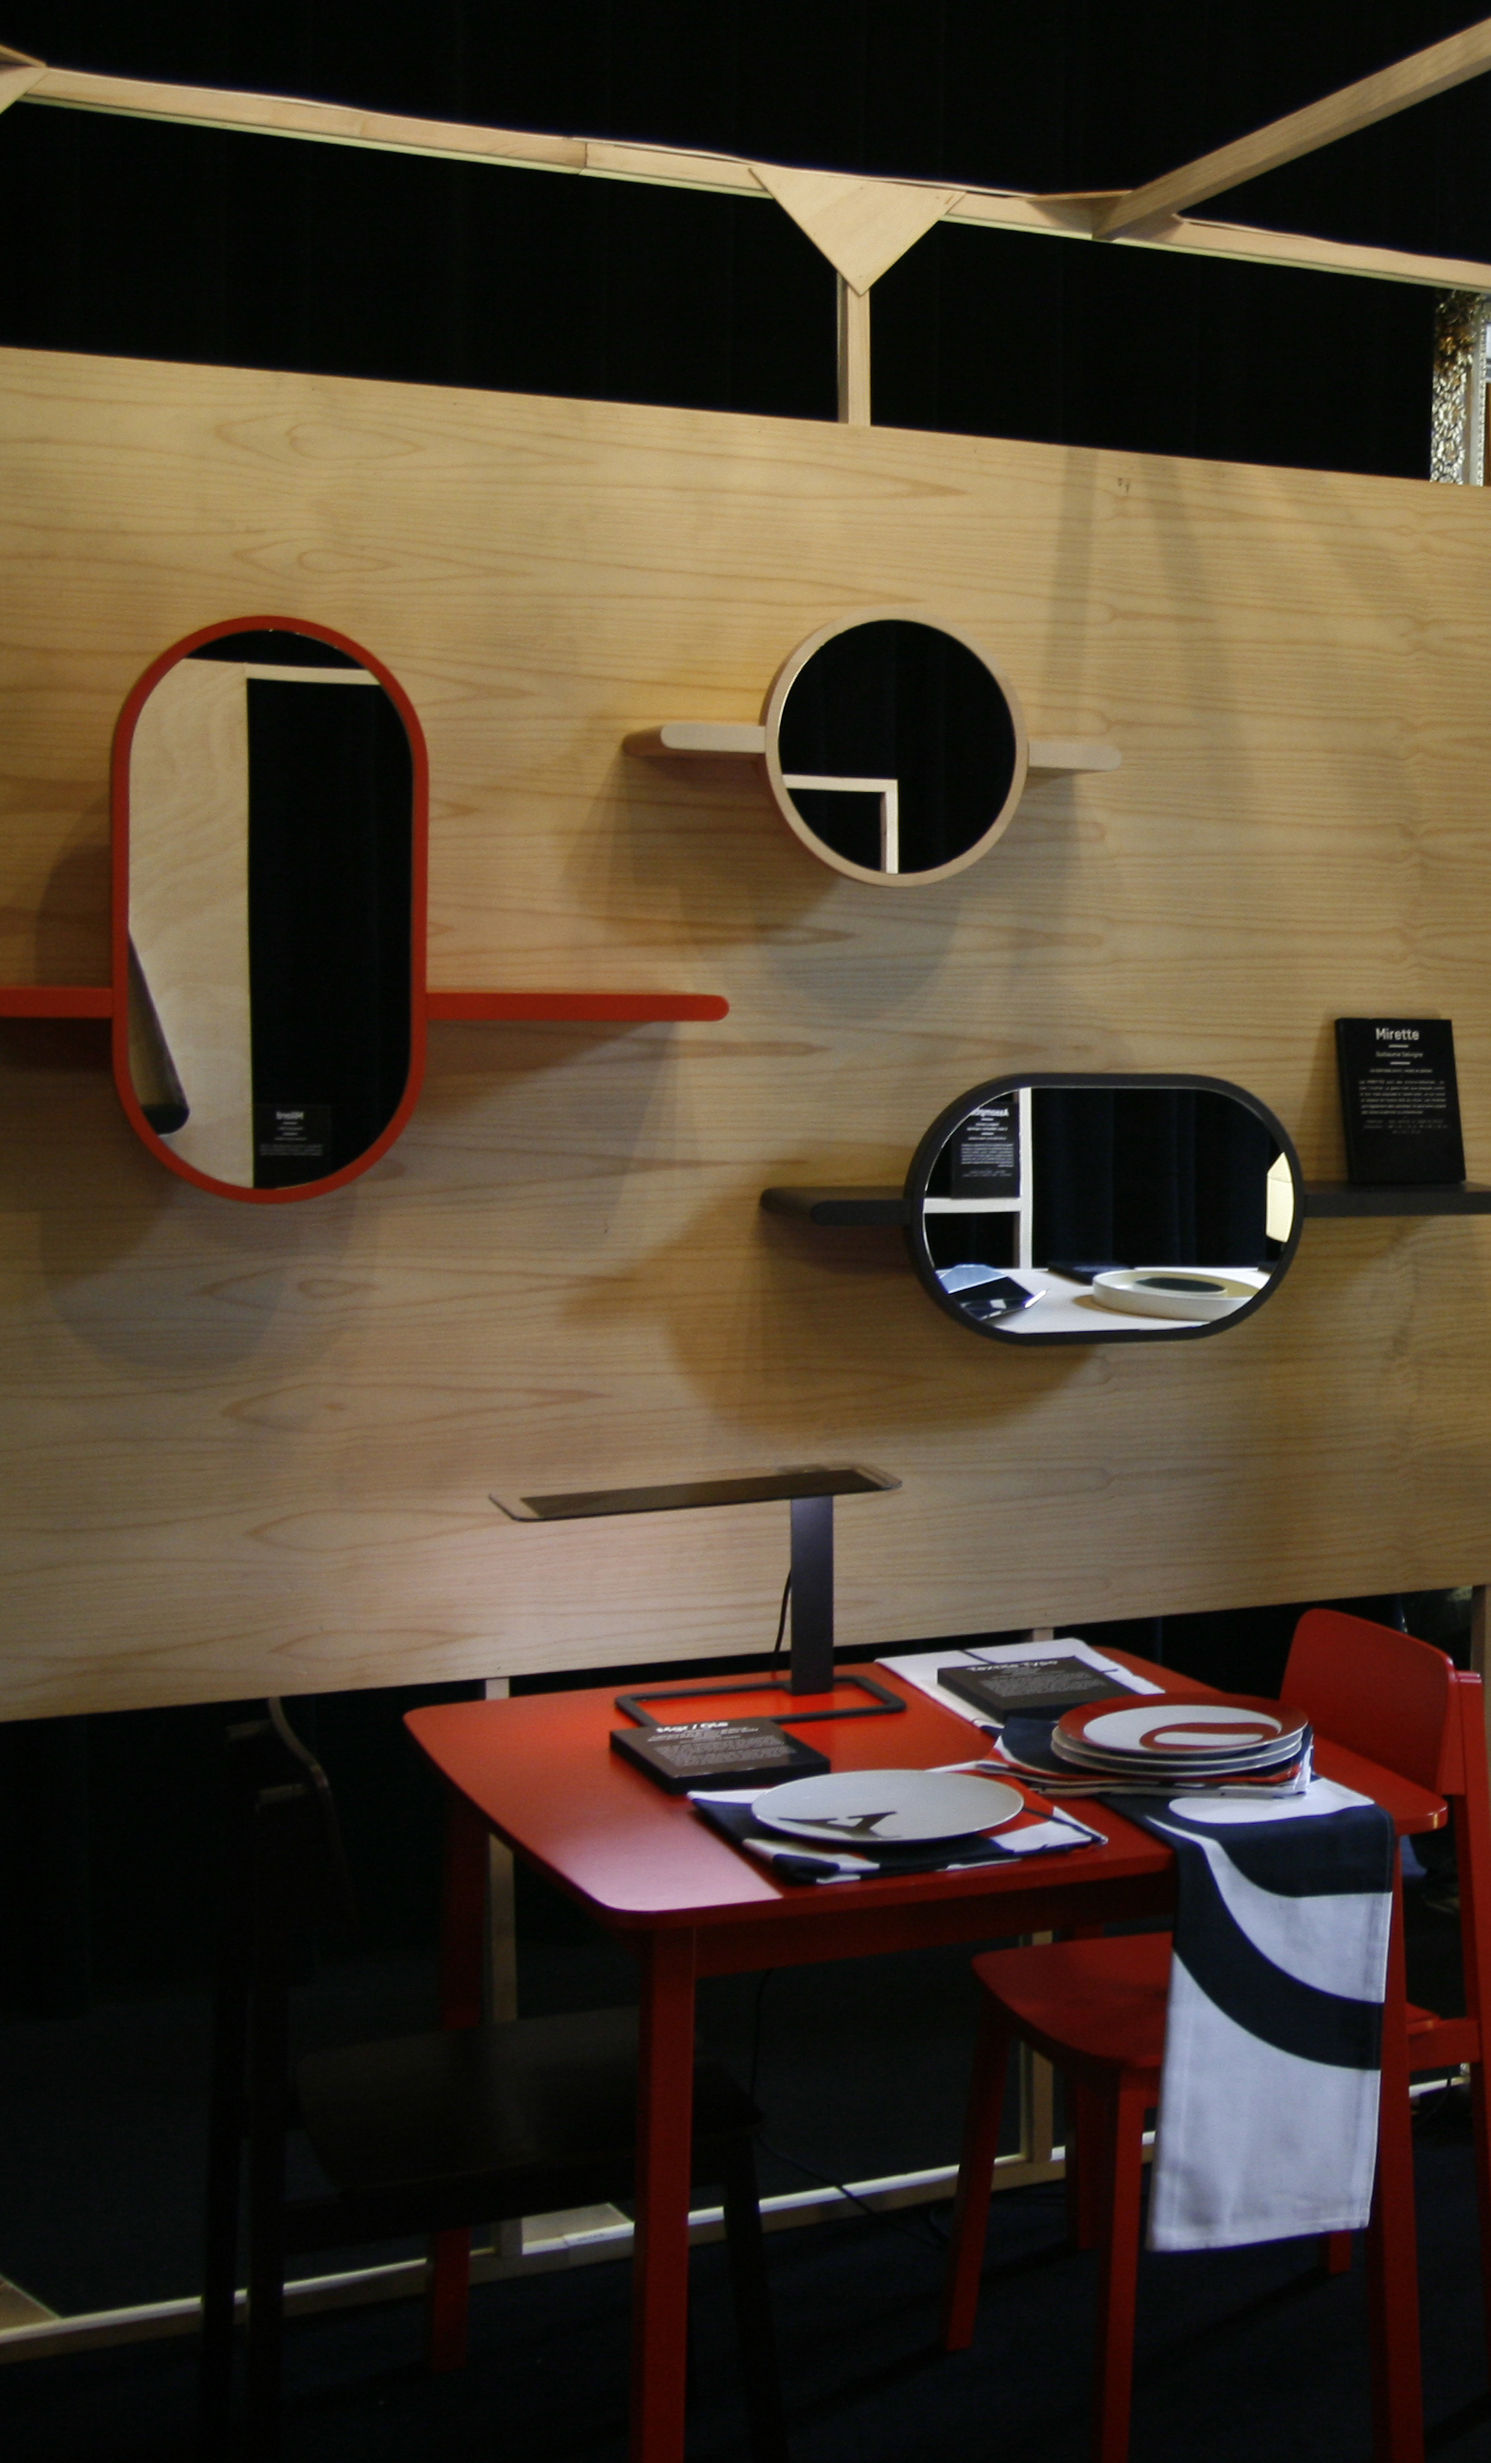 lampe de table ol tecnologia oled by blackbody noir. Black Bedroom Furniture Sets. Home Design Ideas